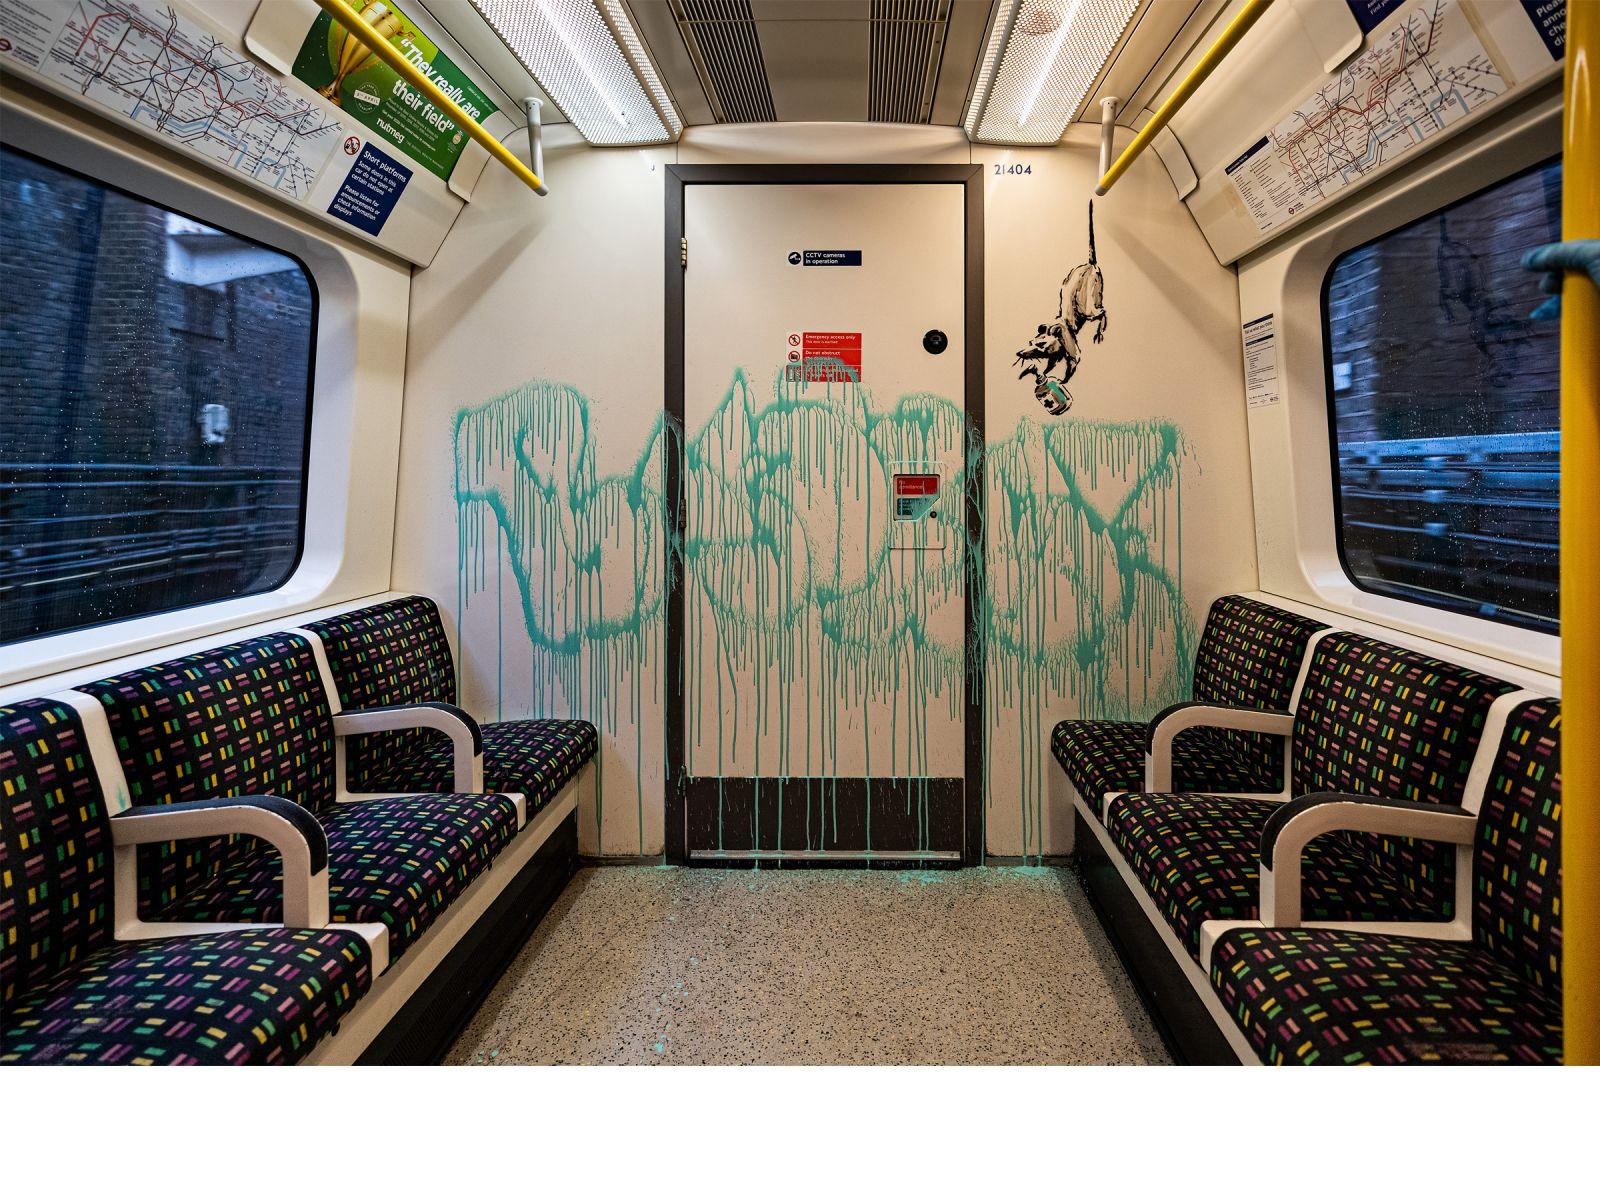 Бэнкси разрисовал вагон лондонского метро чихающими крысами